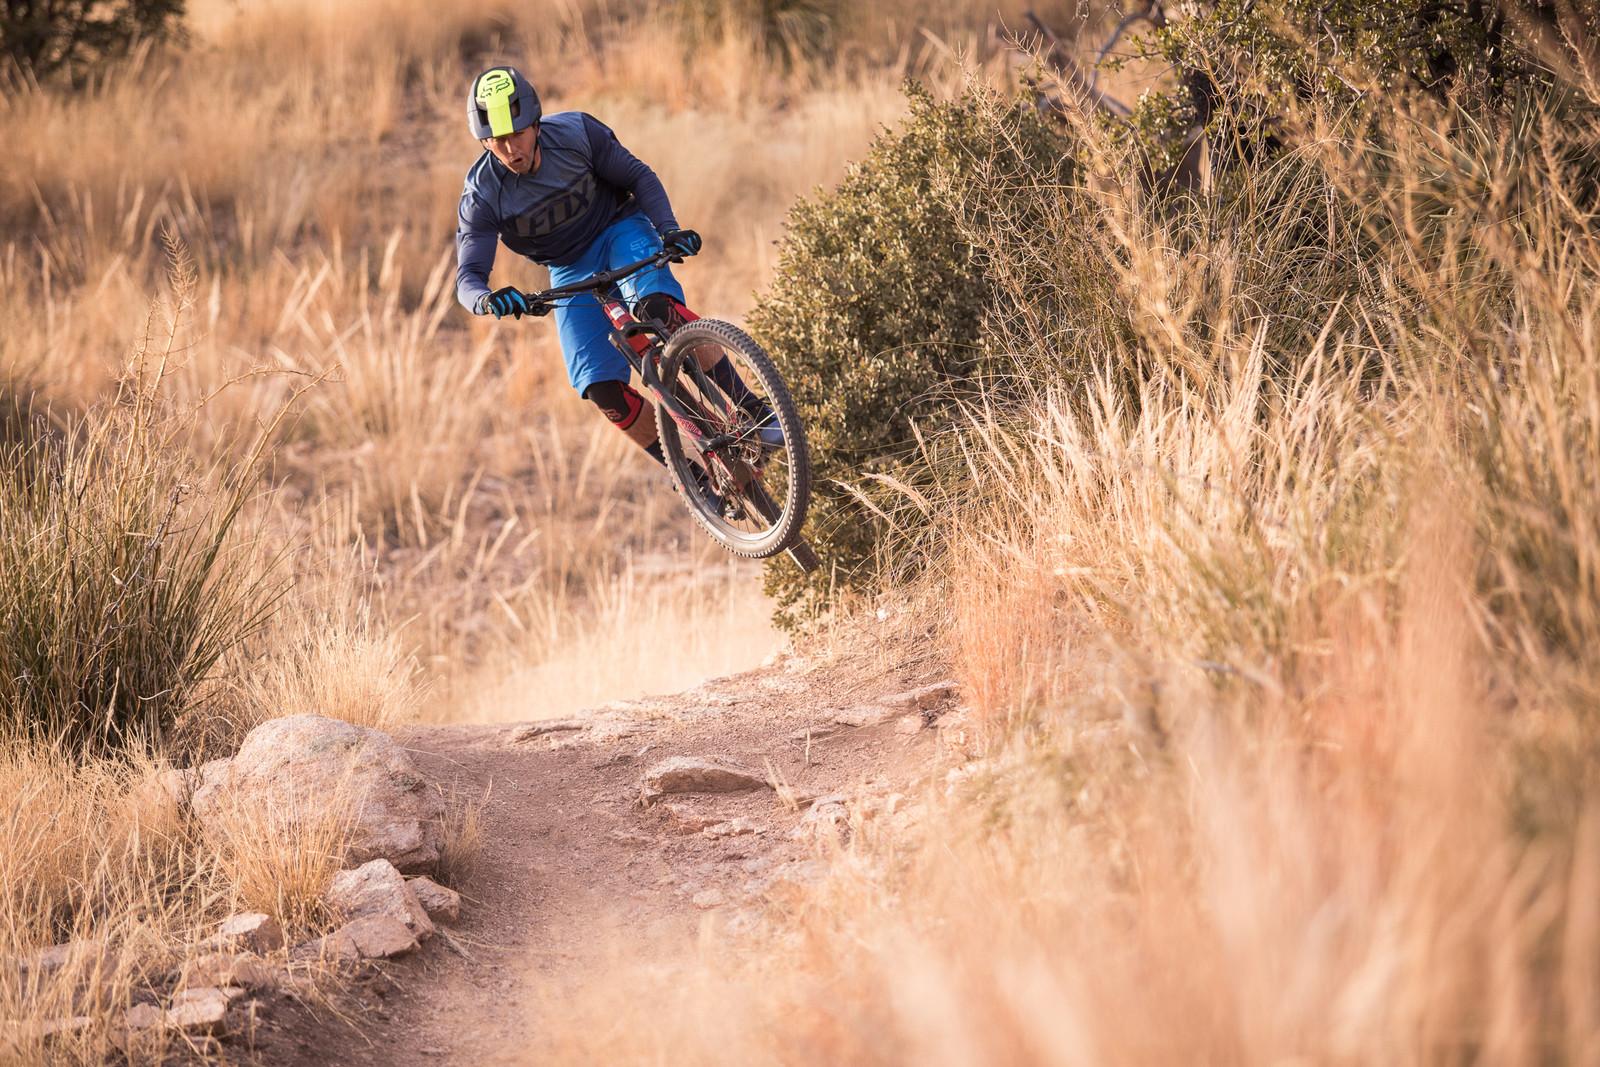 Santa Cruz Hightower C S - 2017 Vital MTB Test Sessions - Santa Cruz Hightower C S - 2017 Vital MTB Test Sessions - Mountain Biking Pictures - Vital MTB